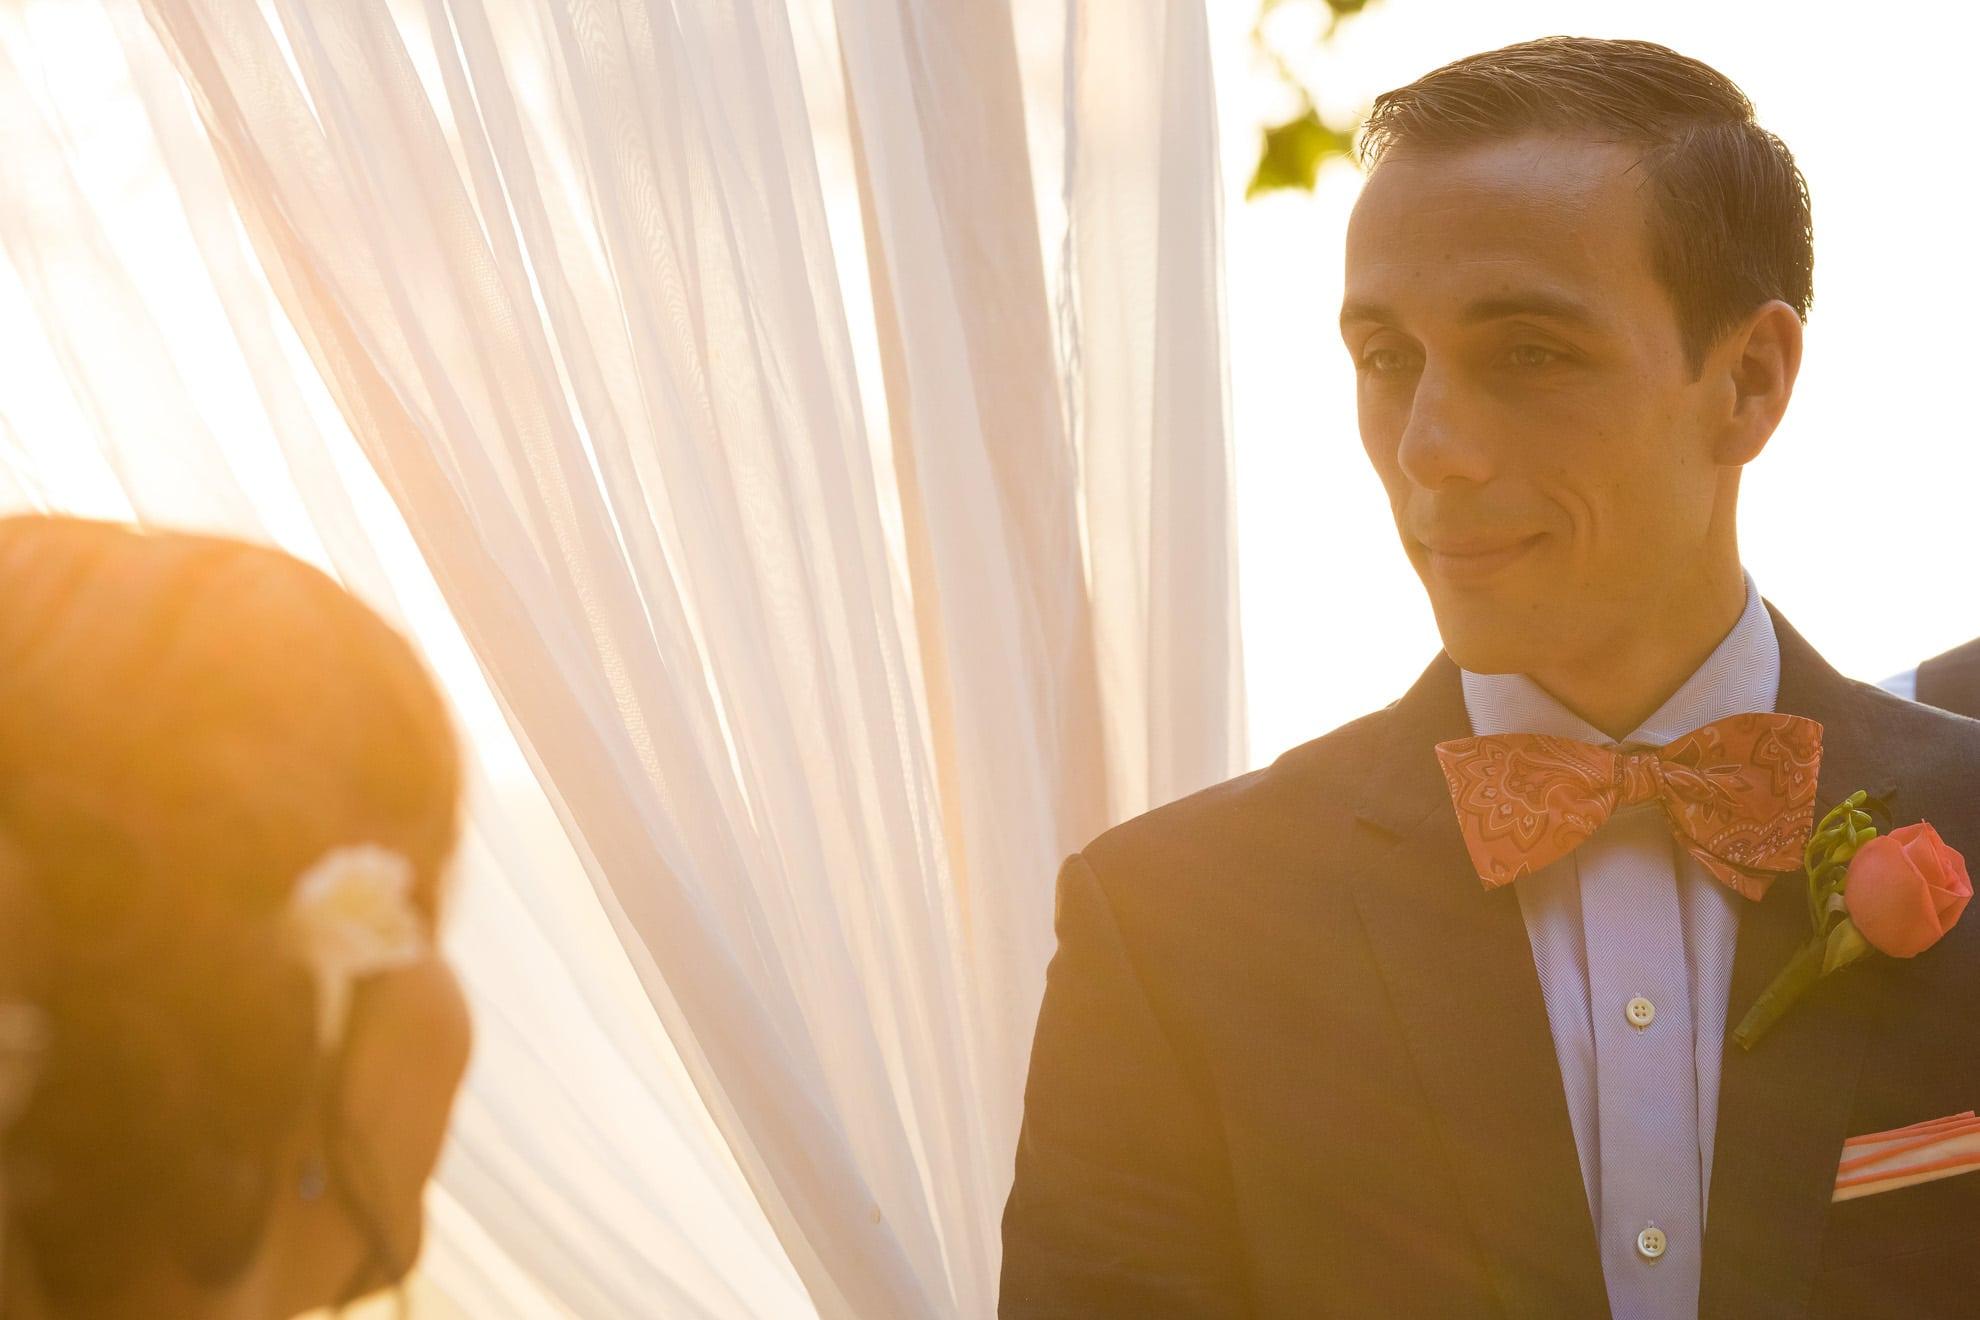 Groom looking at bride at wedding ceremony